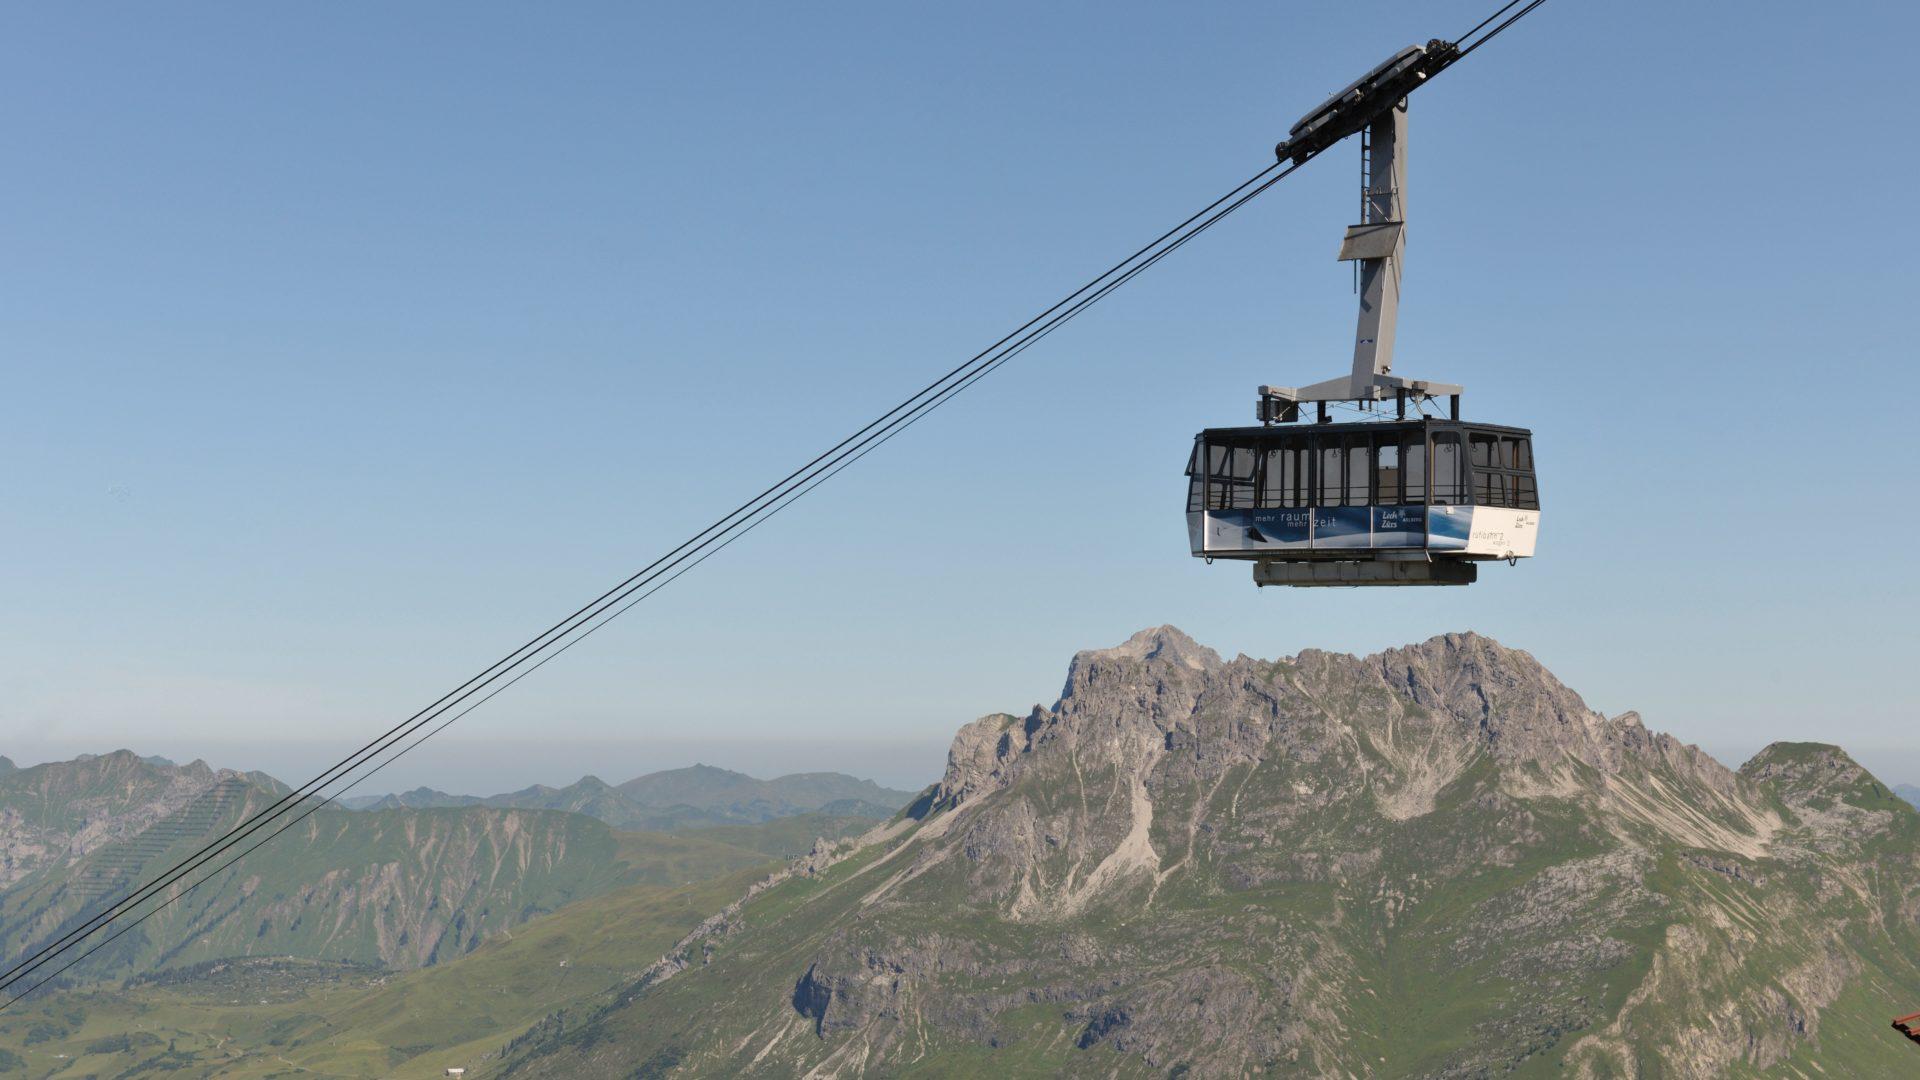 Rüfikopfbahn Lech am Arlberg